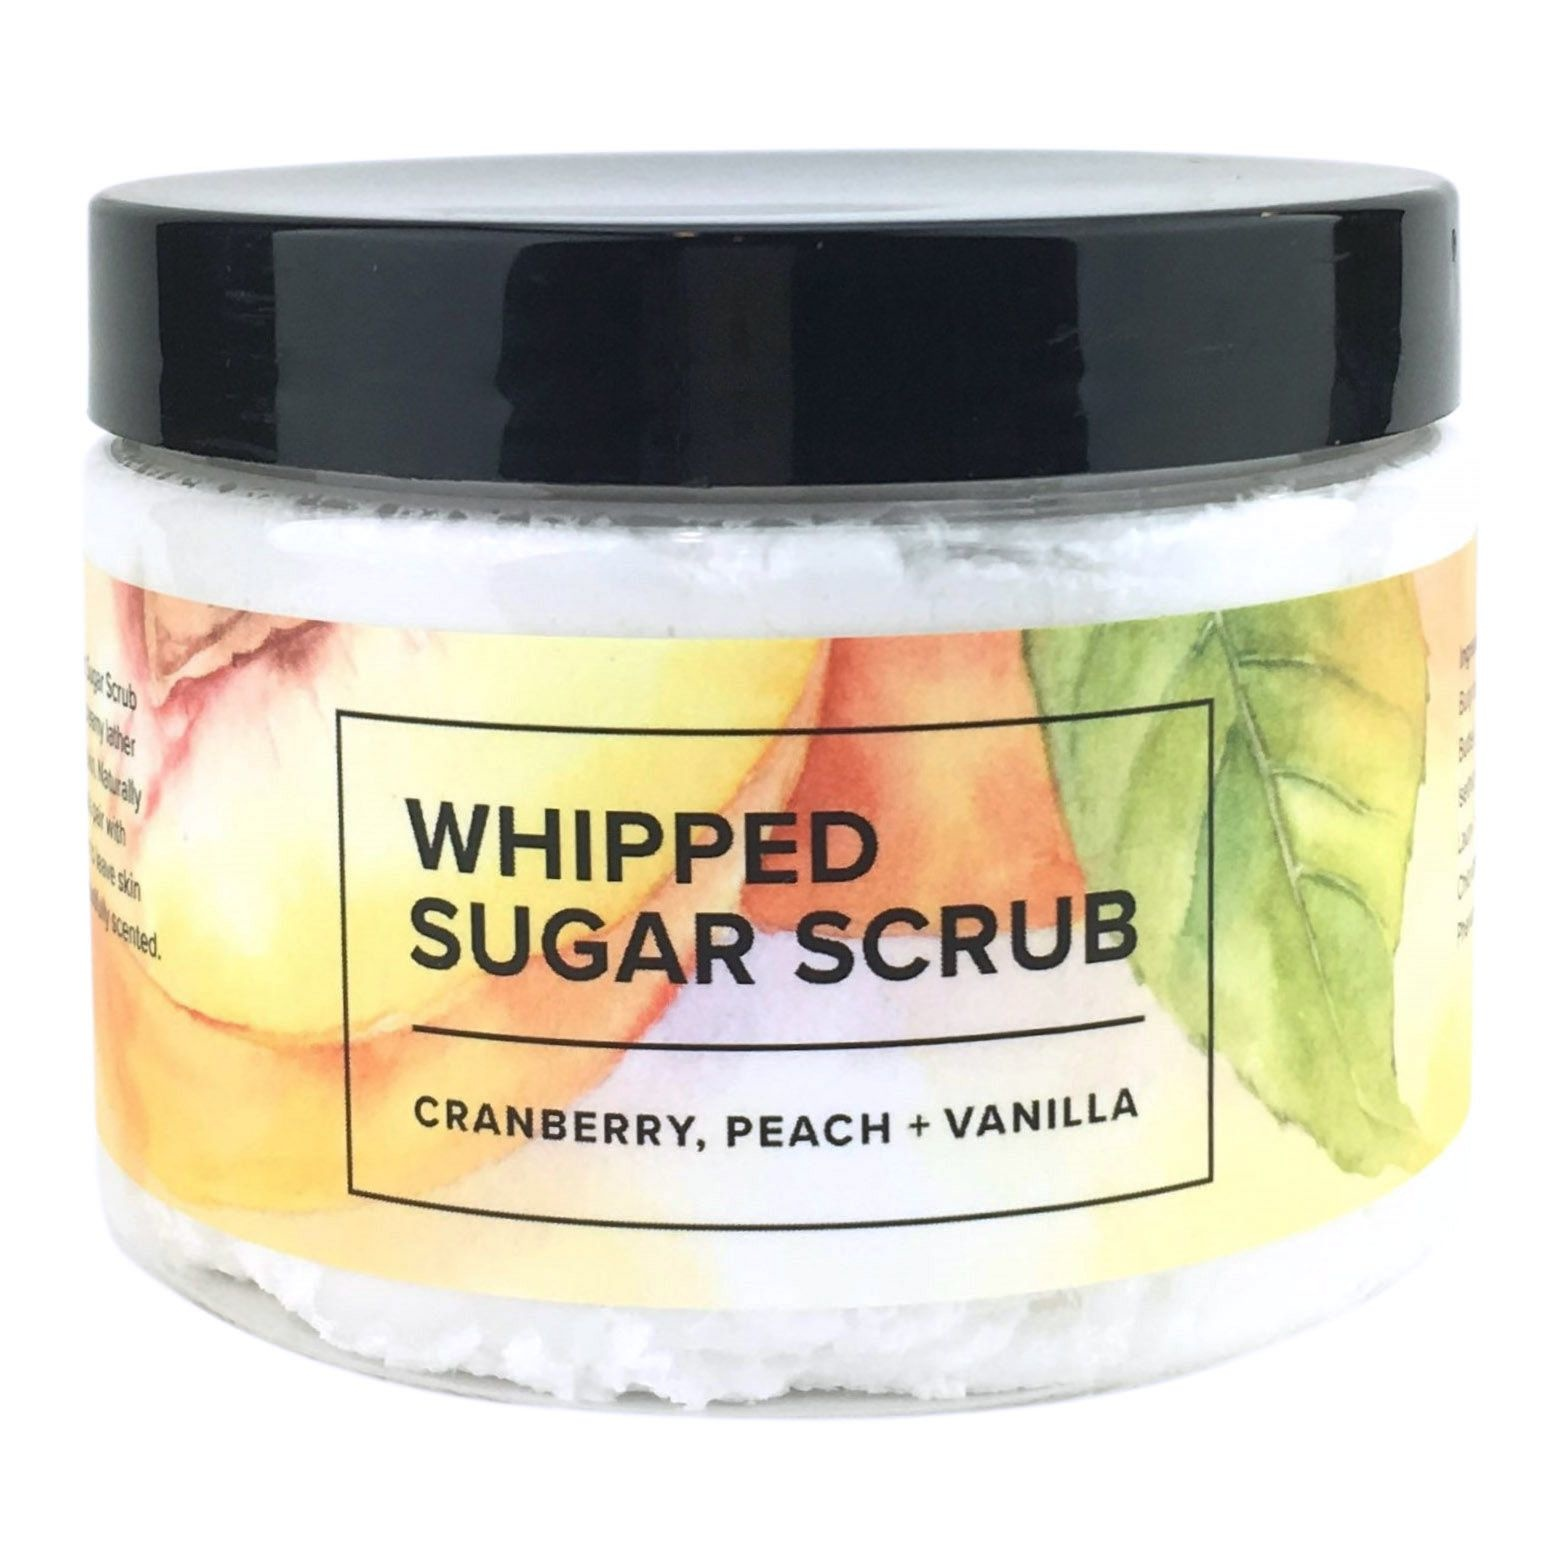 Whipped Sugar Scrub - Cranberry, Peach, and Vanilla-1